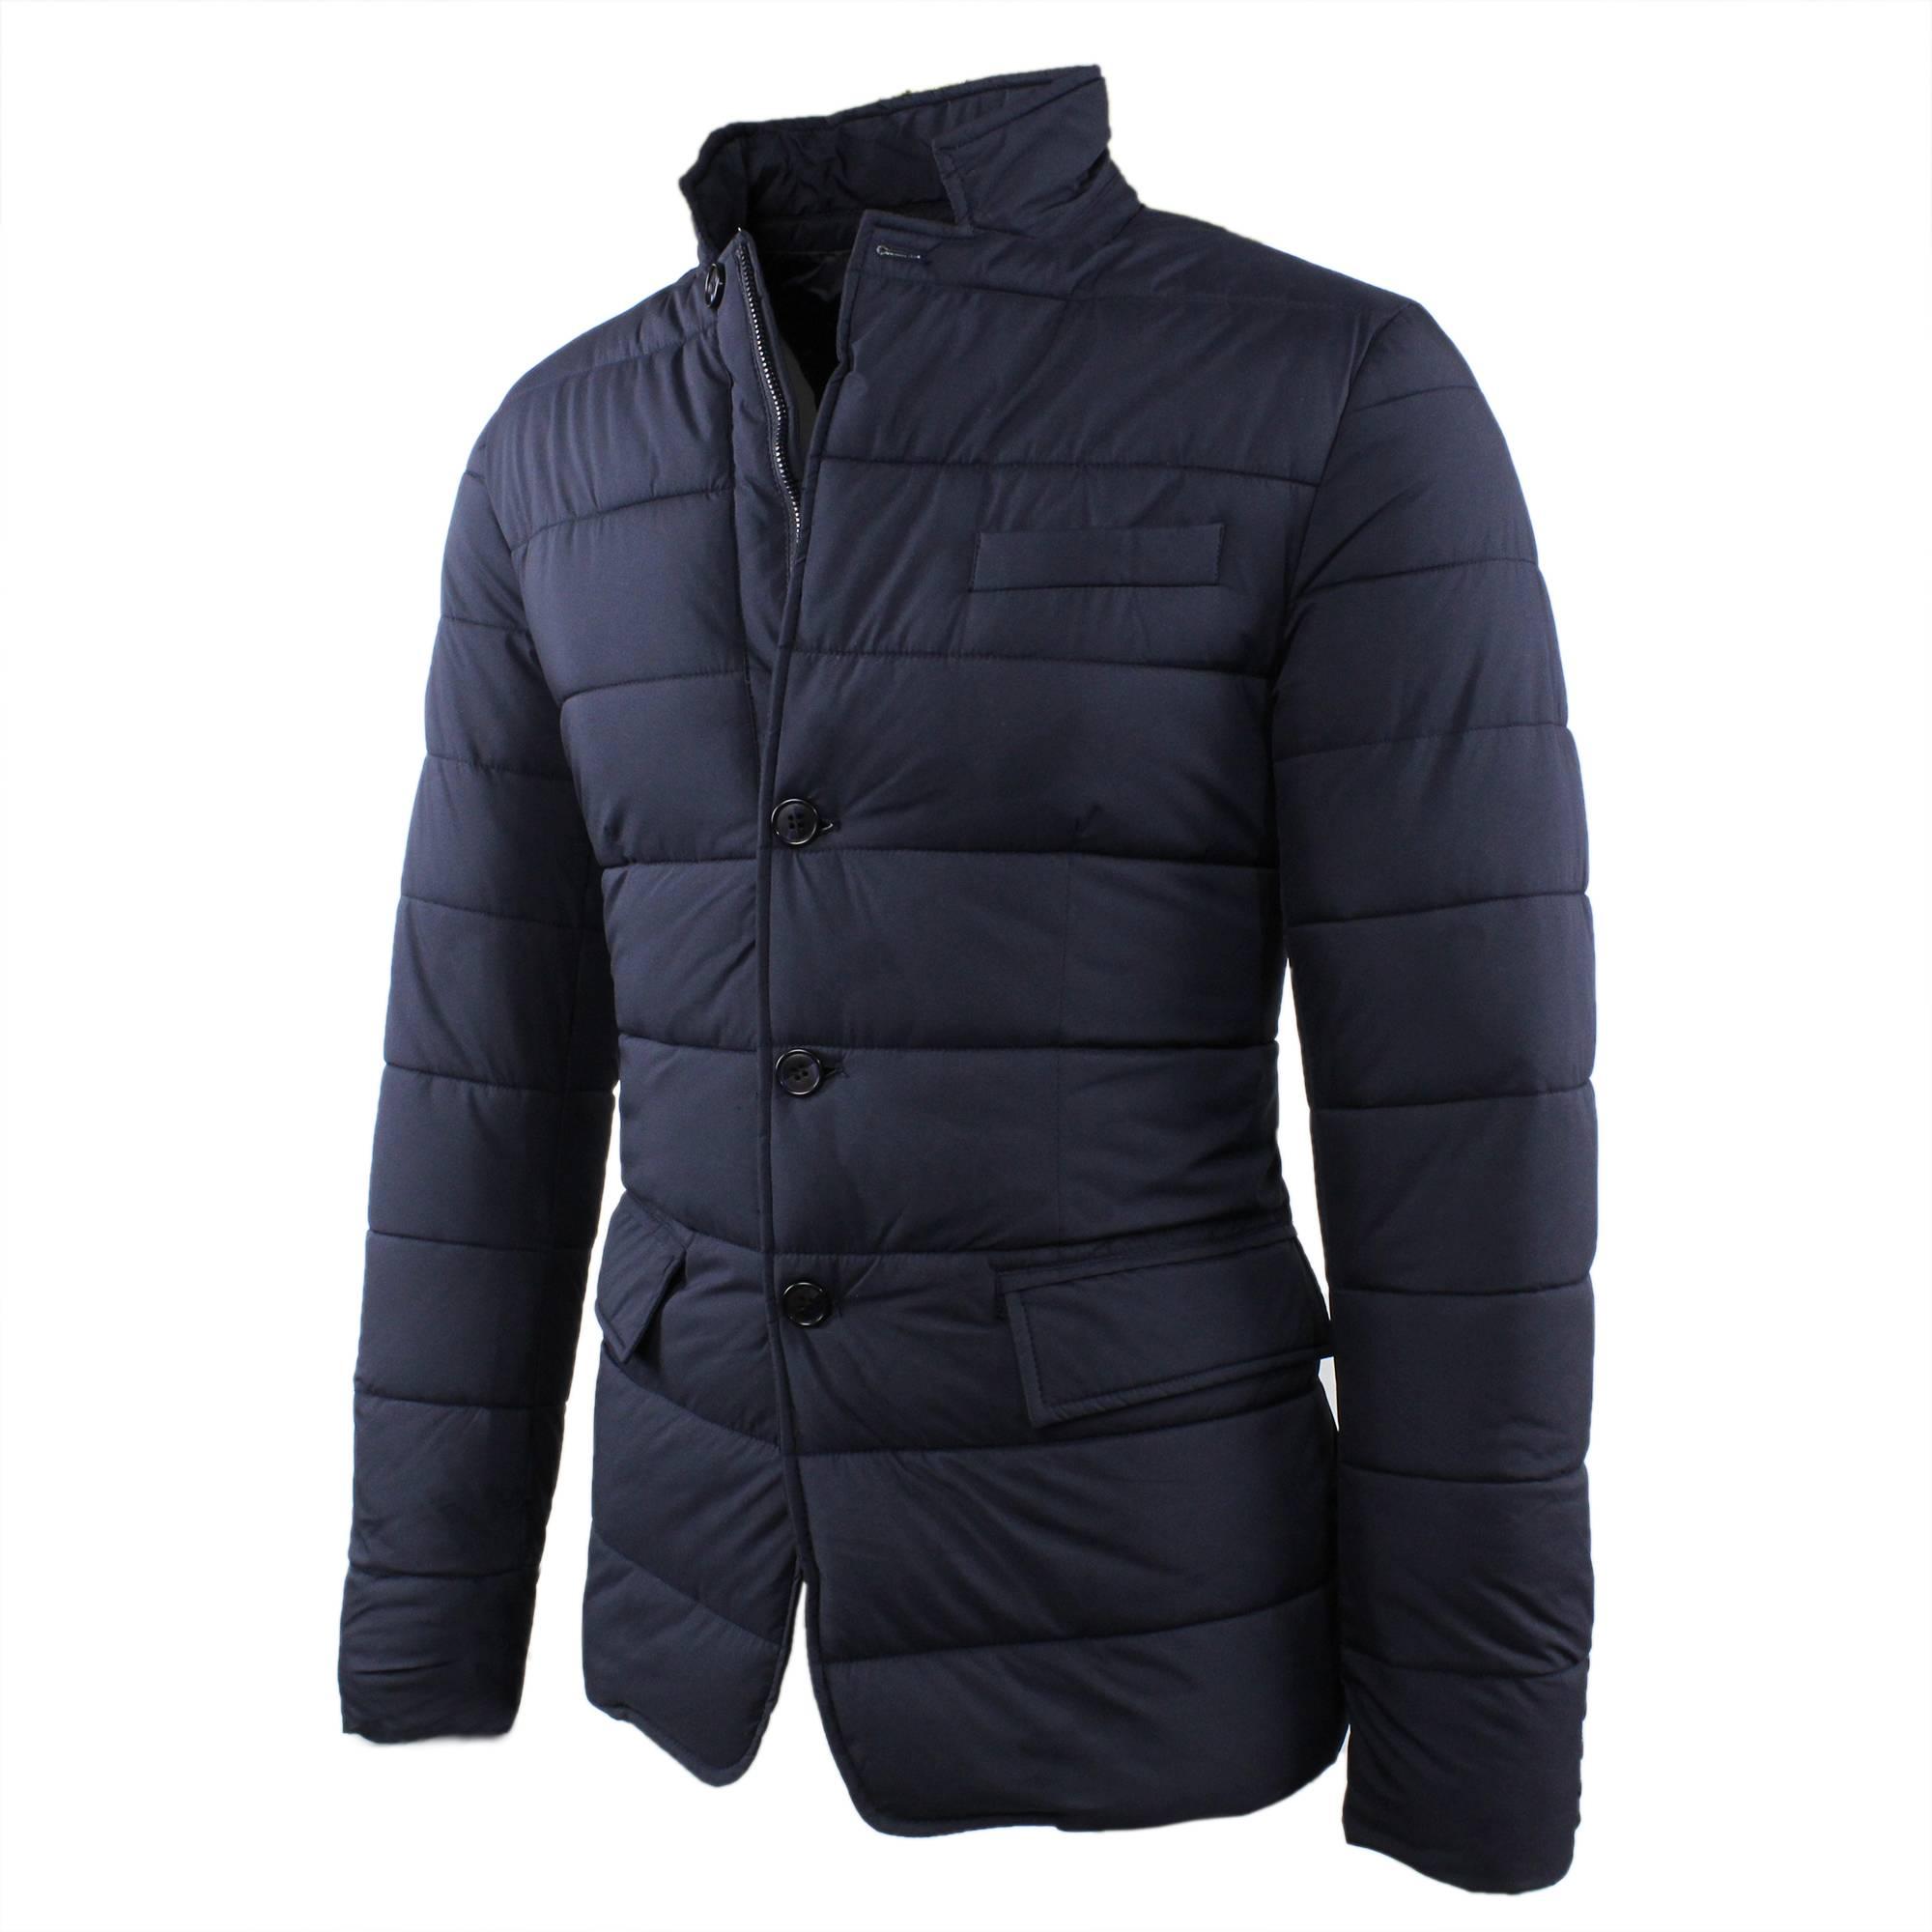 Giubbotto-Uomo-Invernale-Giacca-Trapuntata-Giaccone-Slim-Fit-Elegante-Blu-Nero miniatura 3